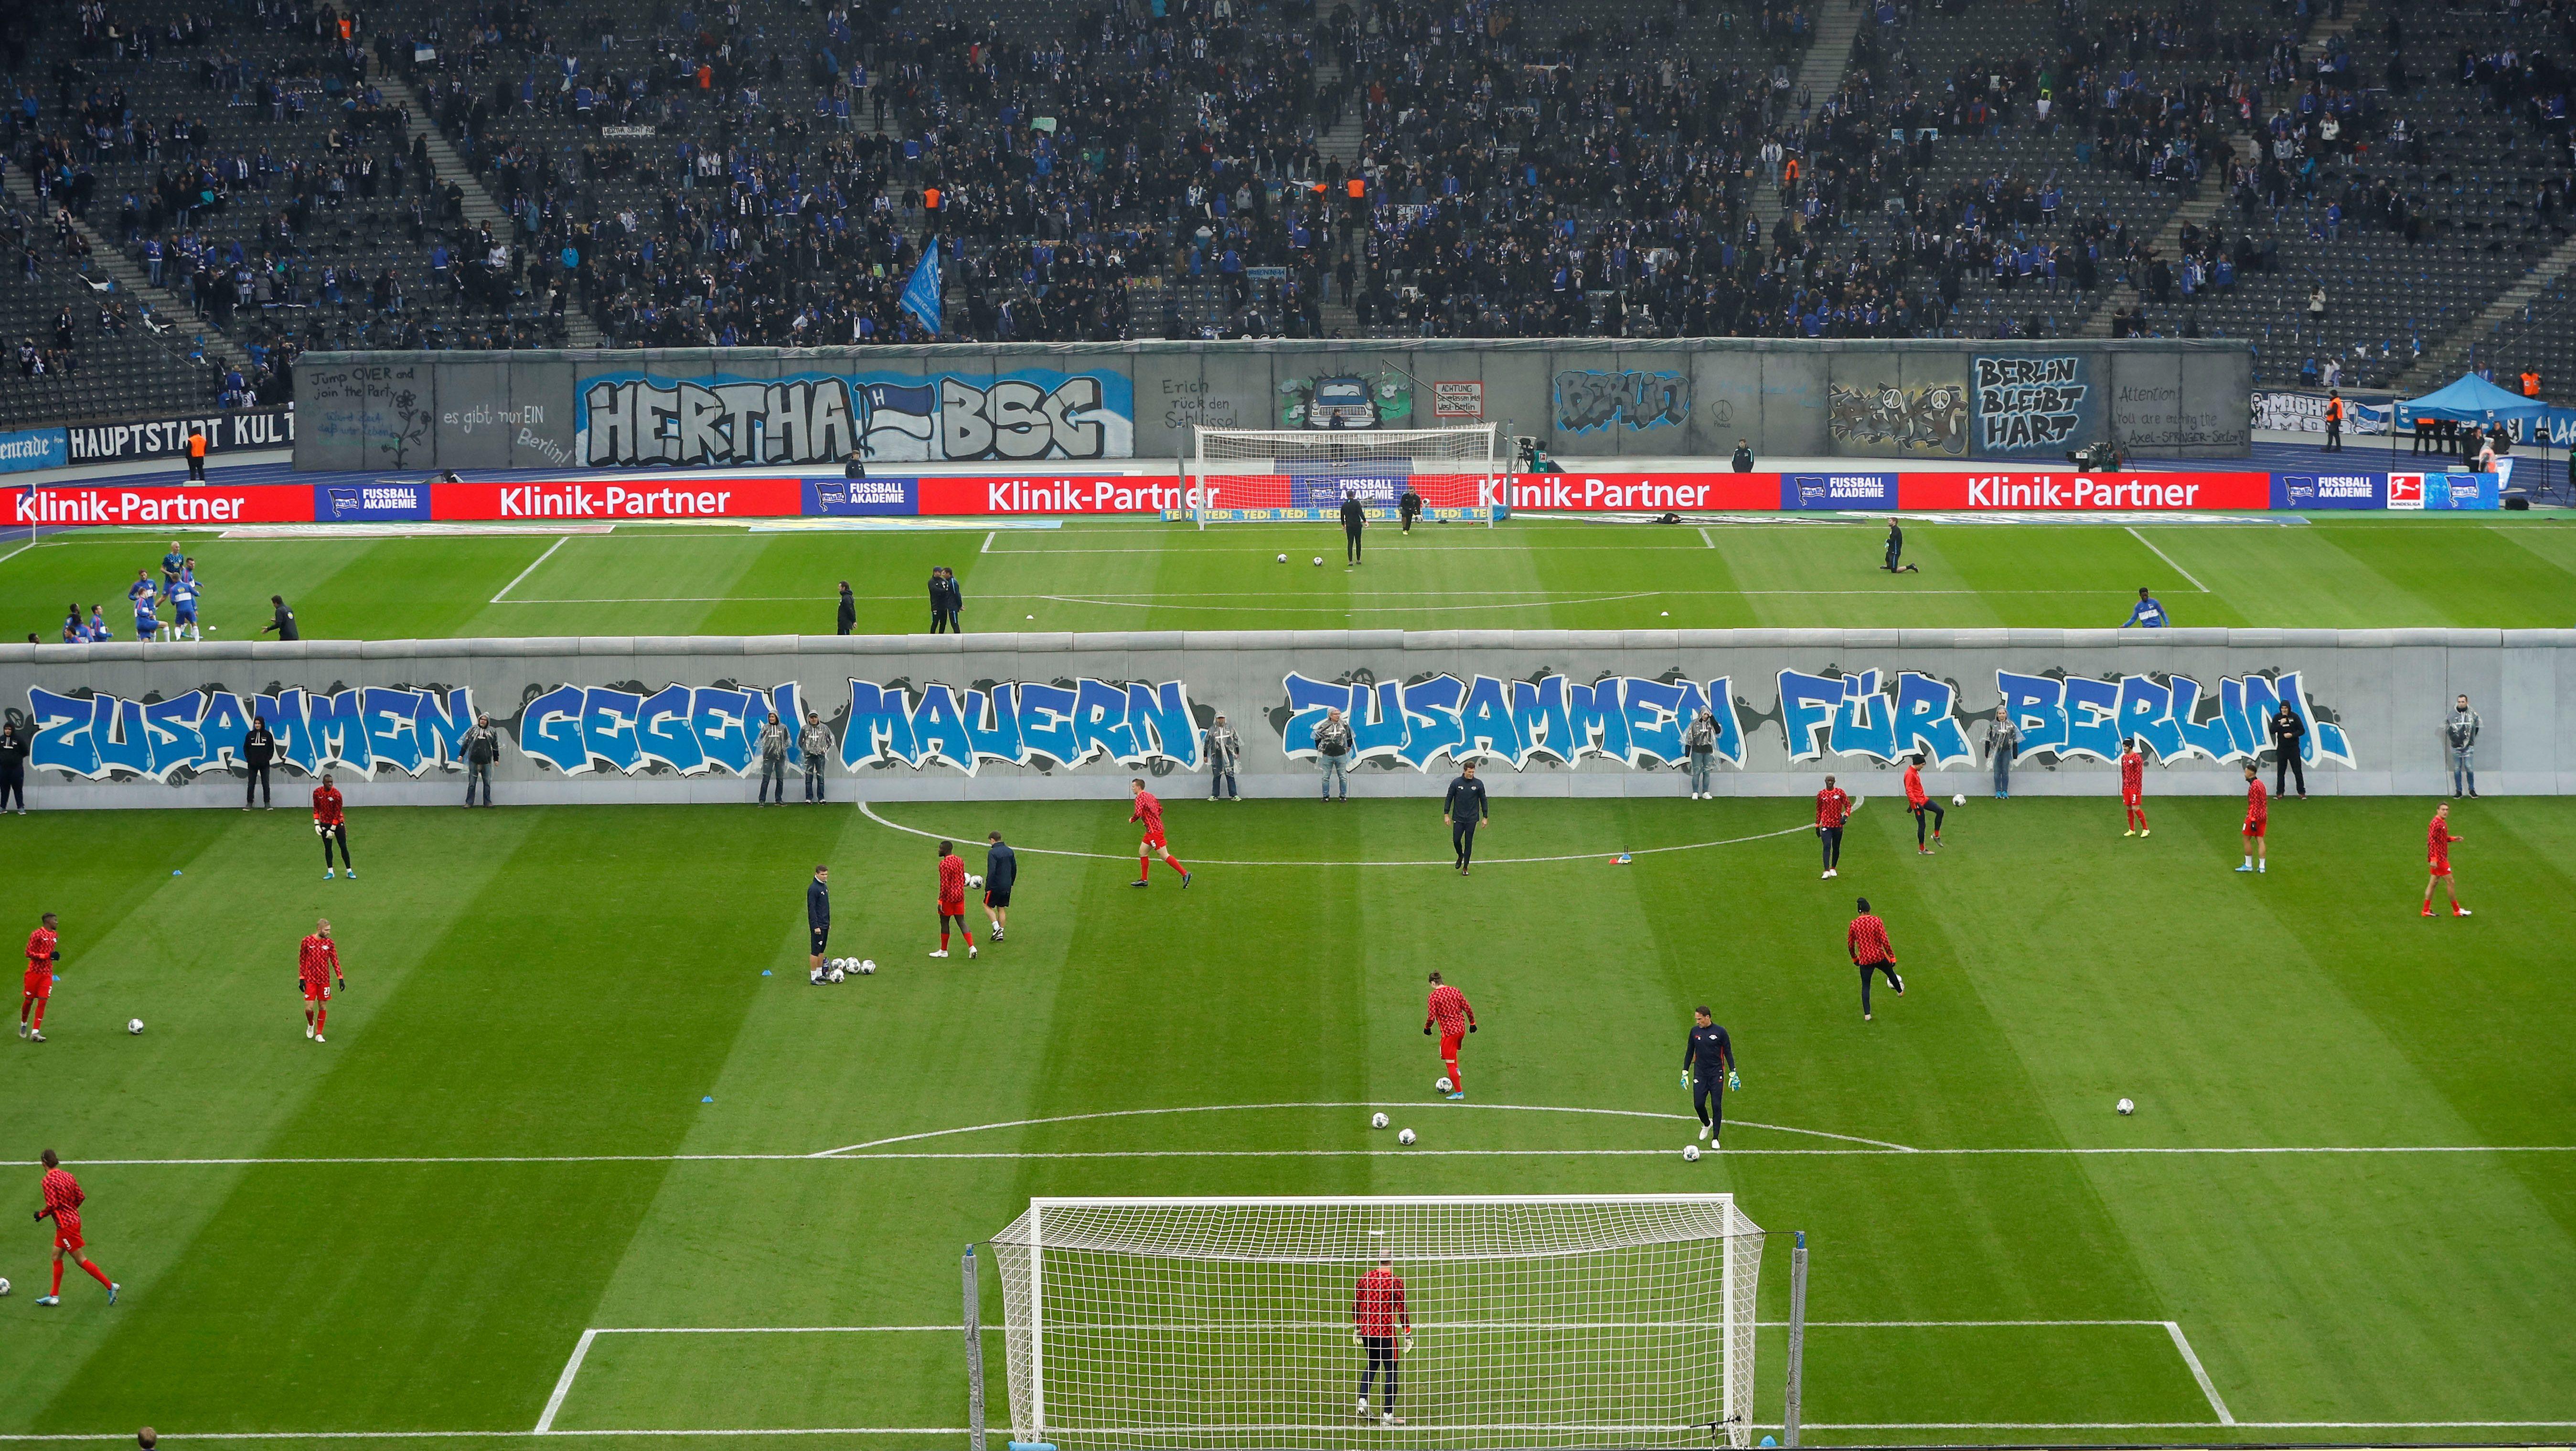 Hertha BSC feiert 30 Jahre Mauerfall